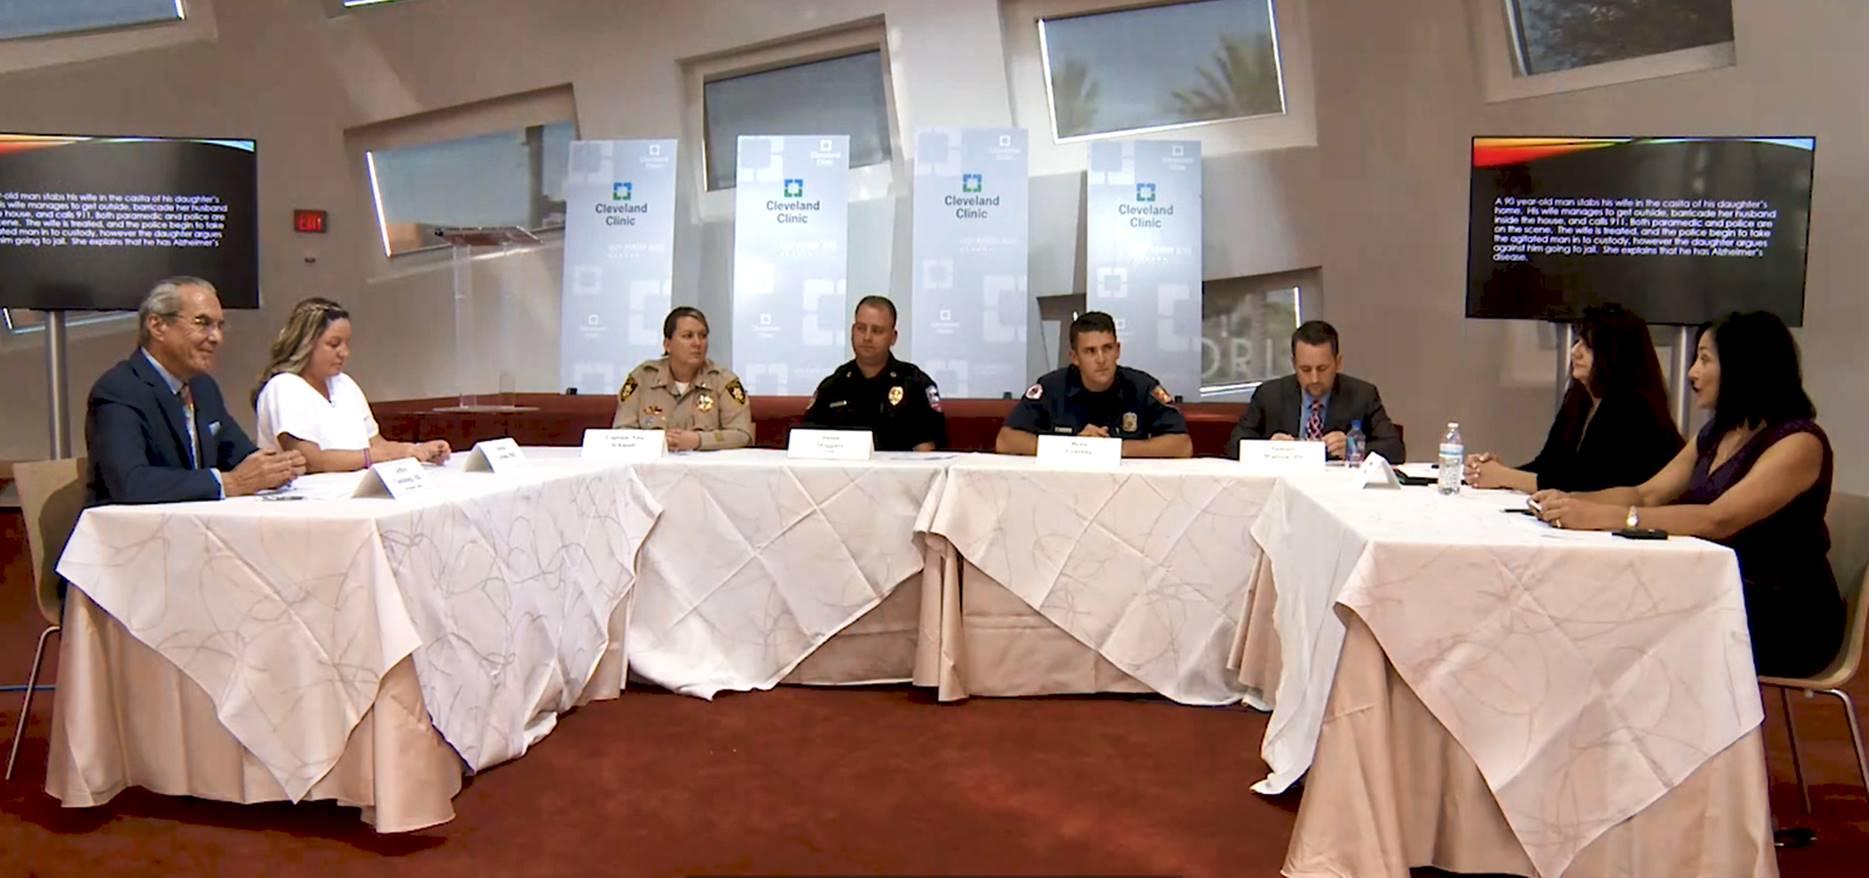 First responders discuss dementia